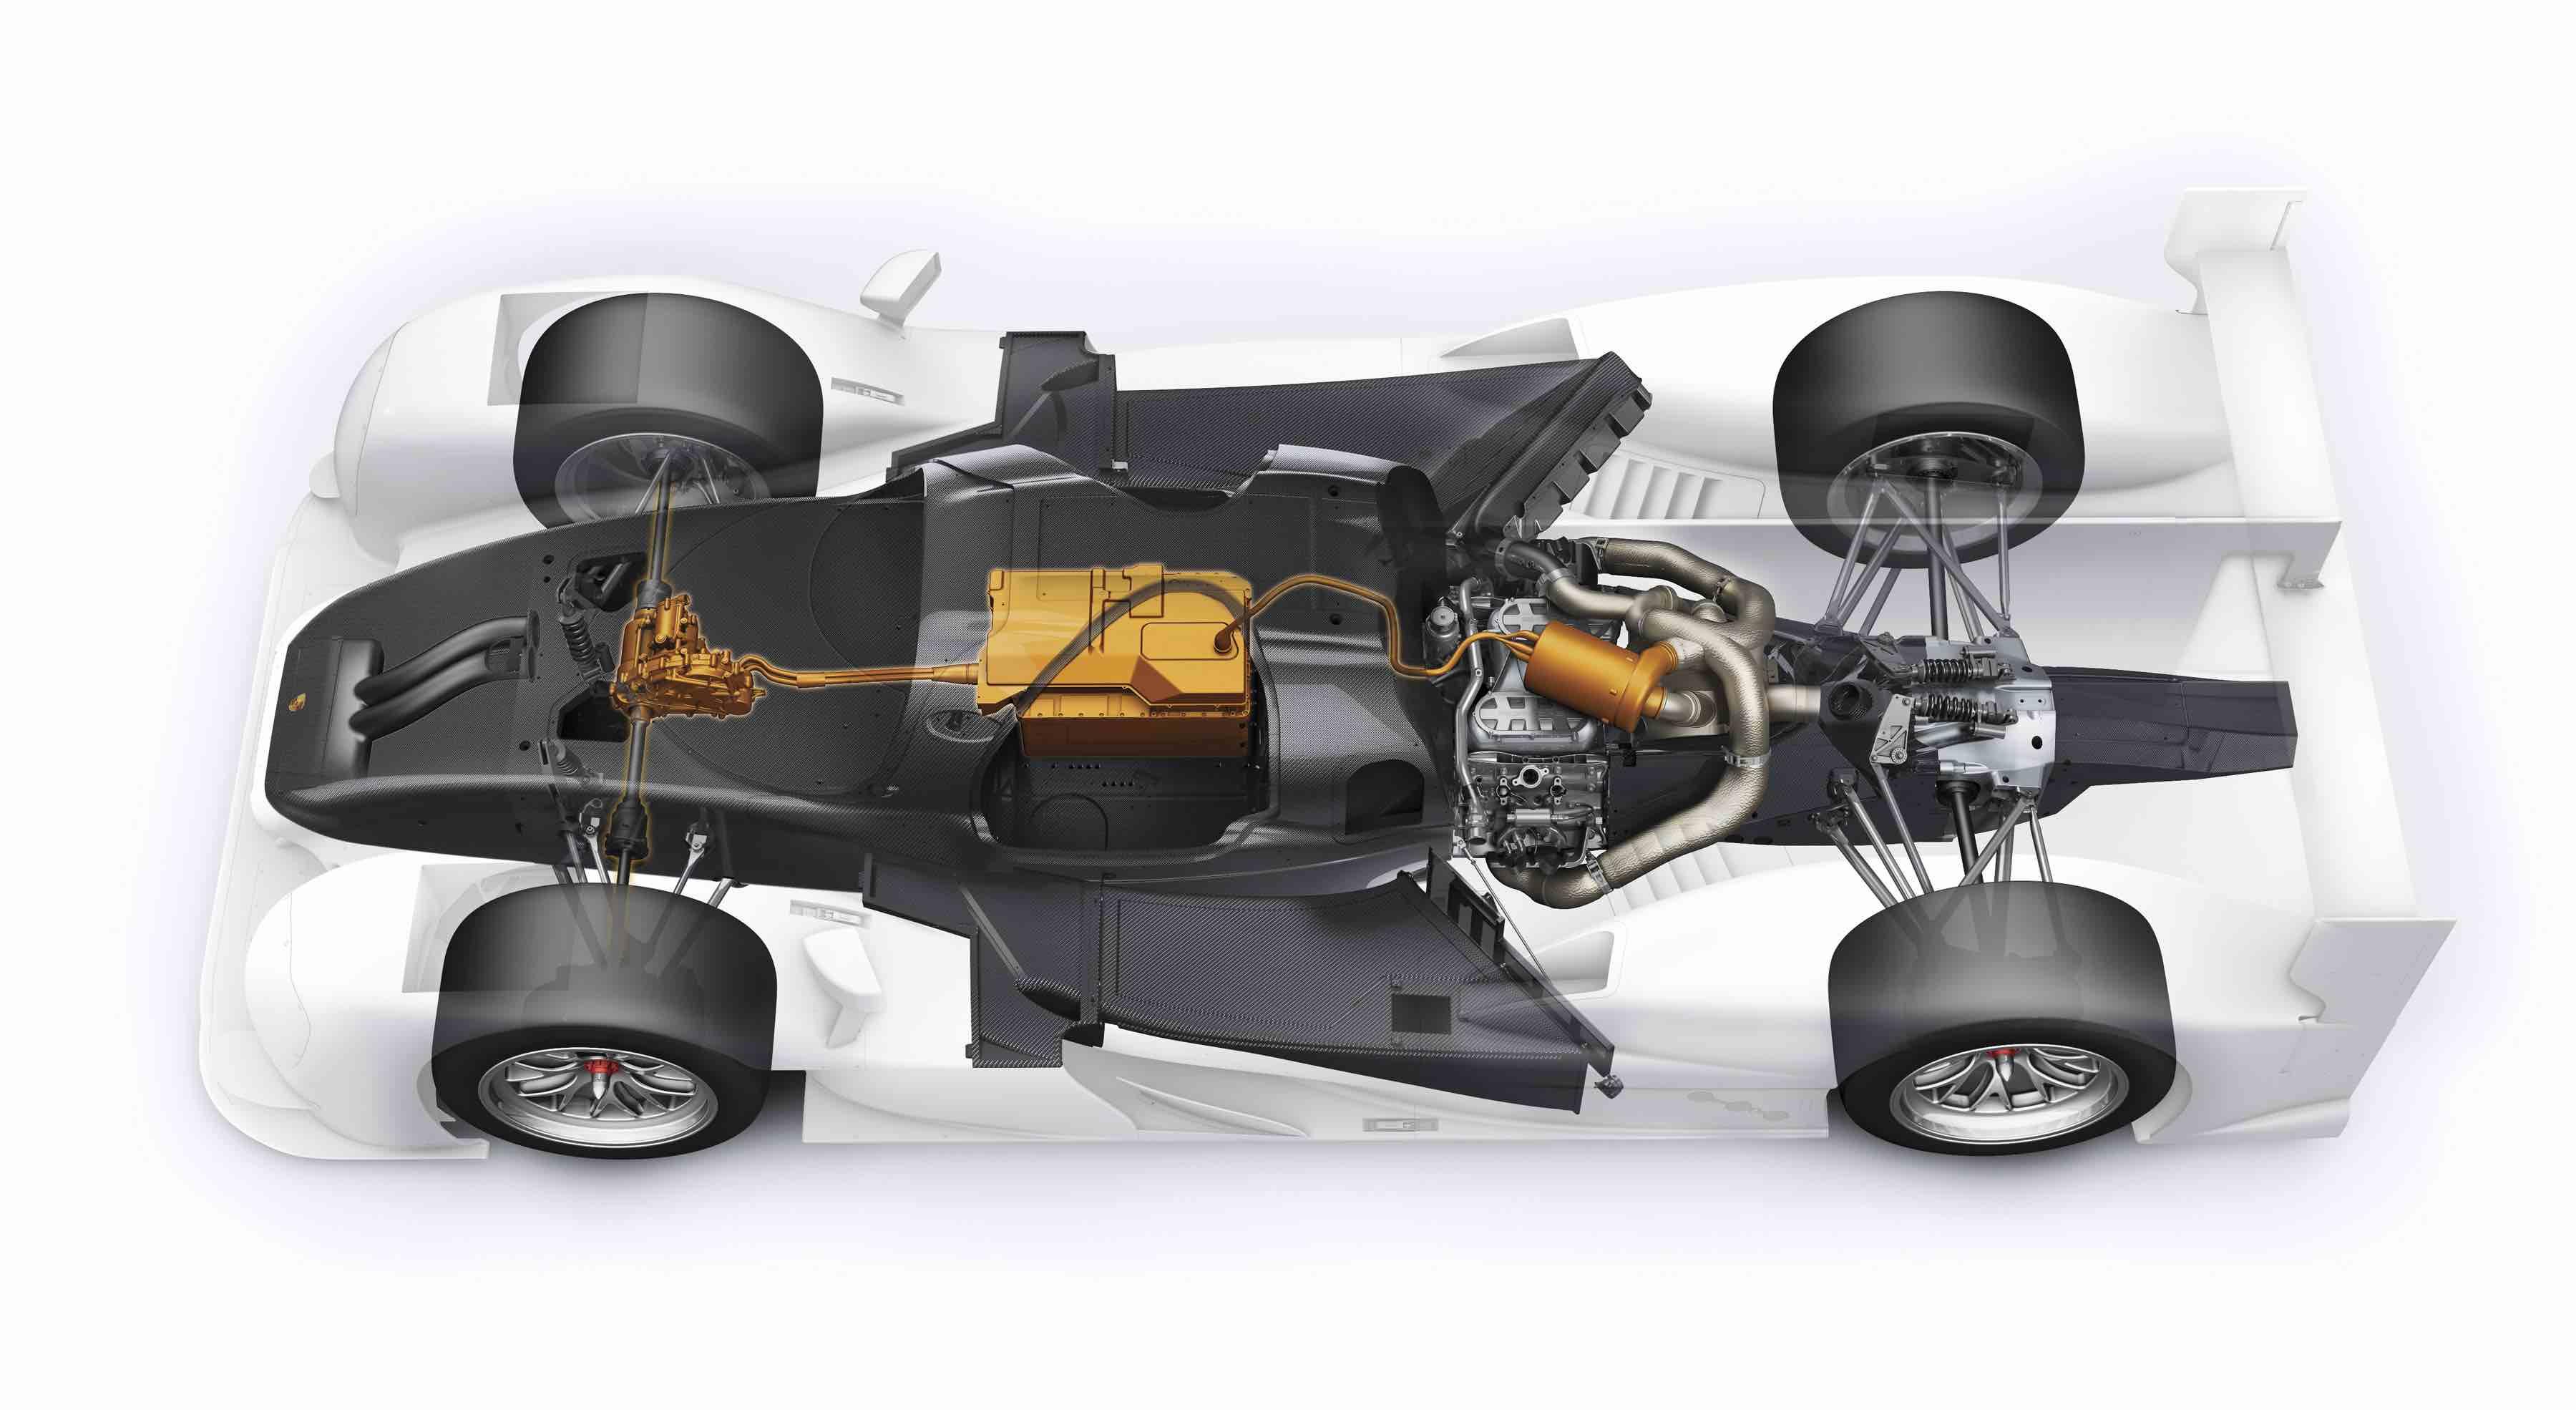 Chassis design of f1 car - 2015 Porsche 919 Hybrid Power Systems Cutaway Jpg